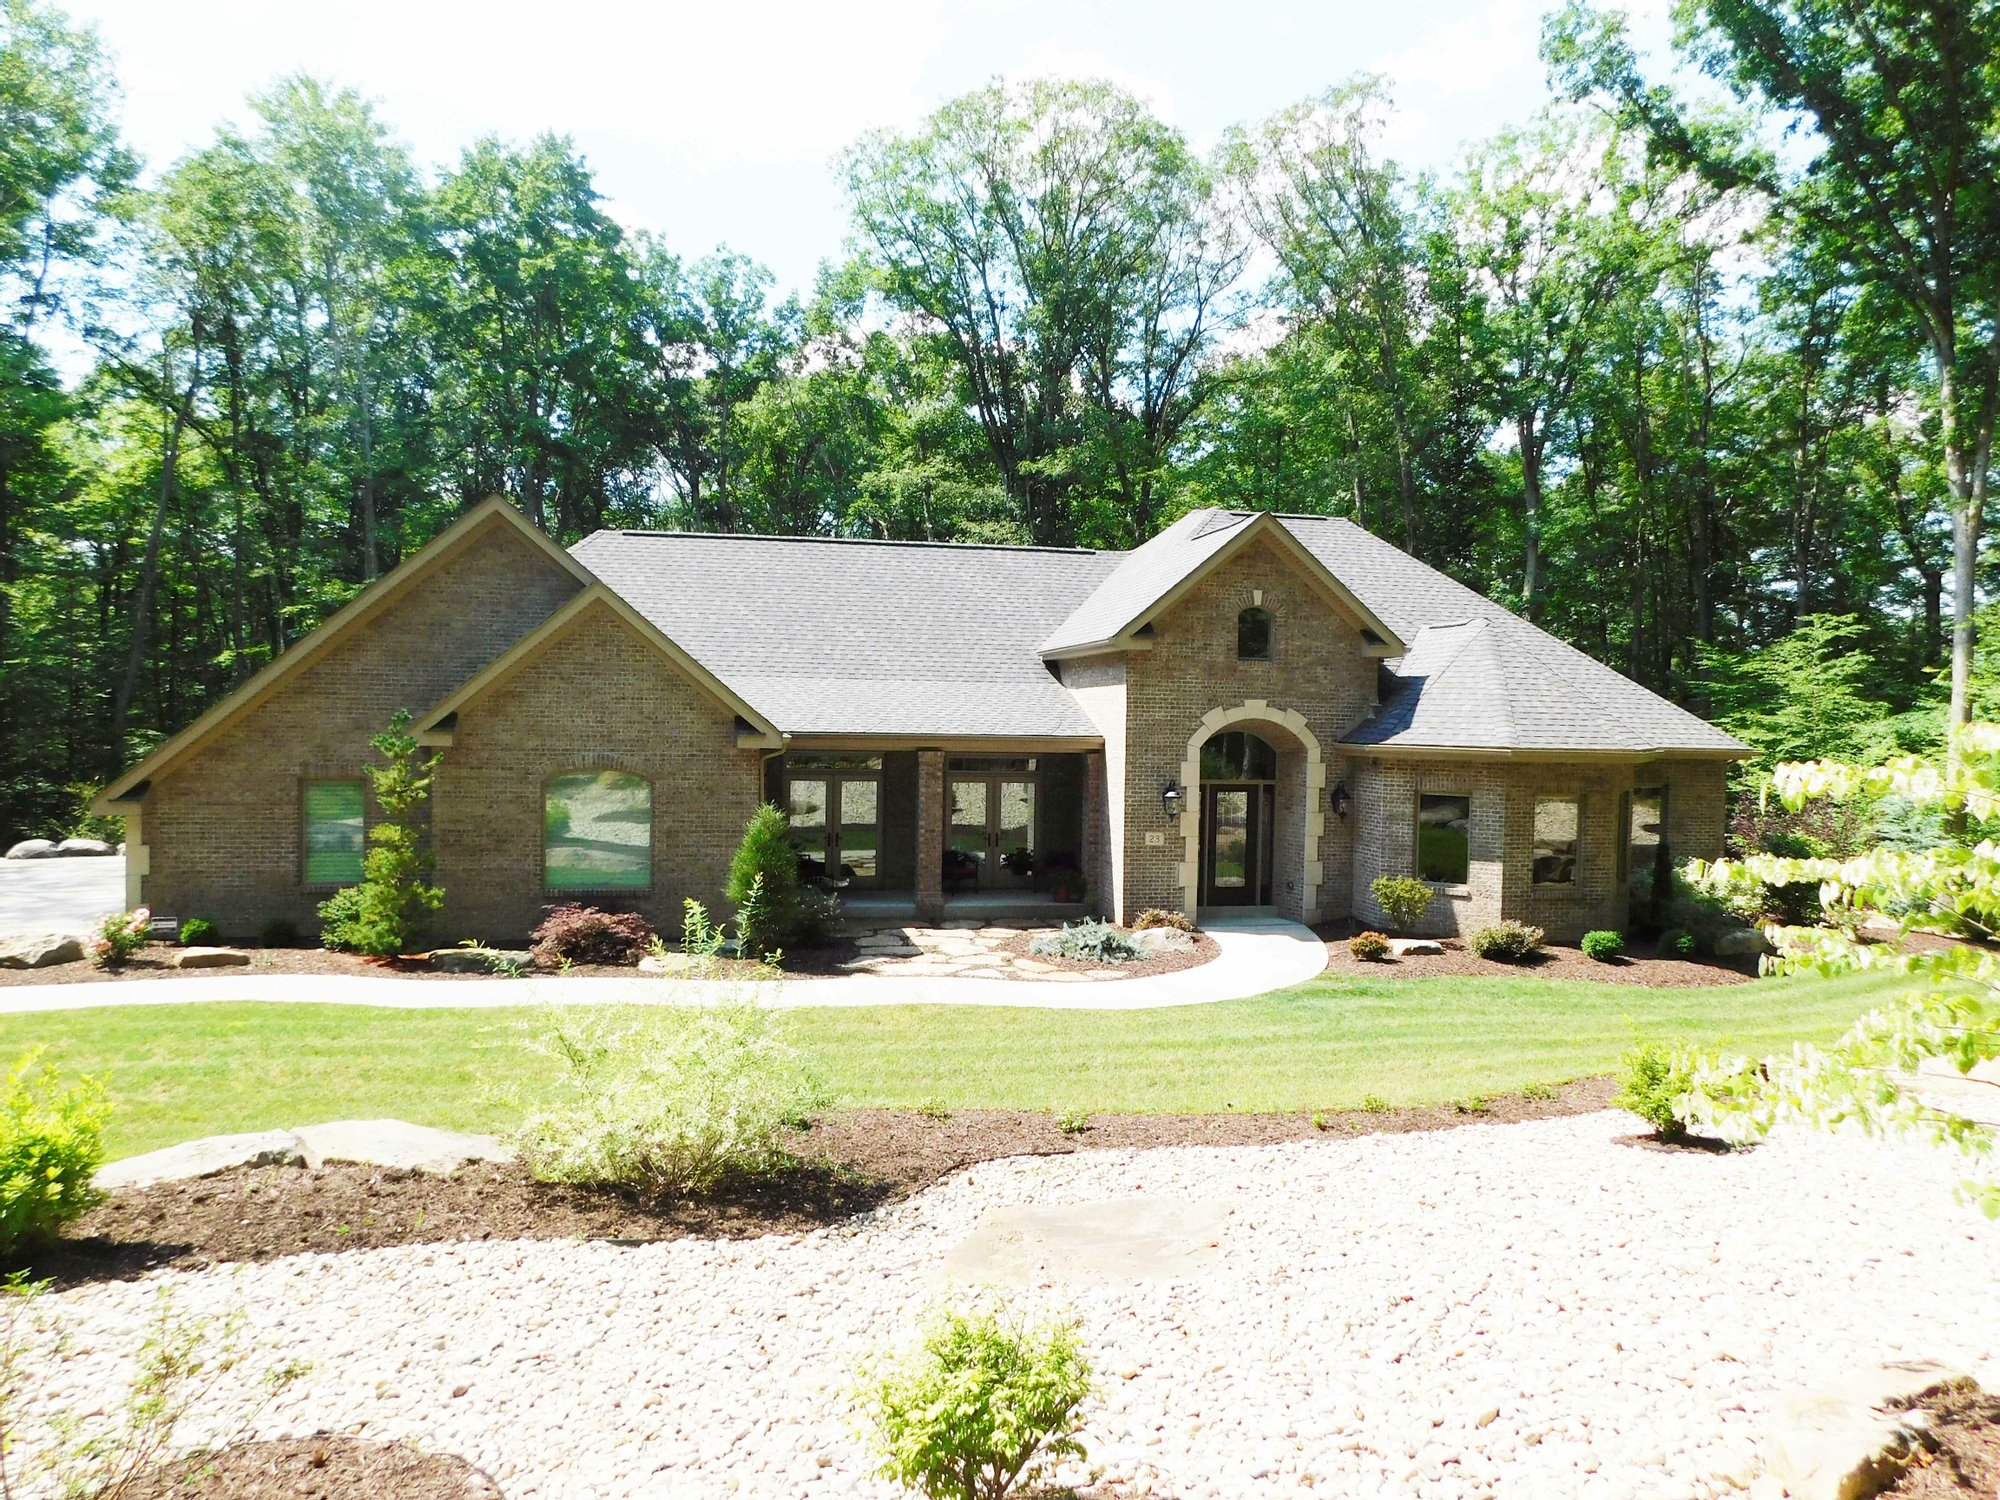 Casa a Farmington, Pennsylvania, Stati Uniti 1 - 11267536